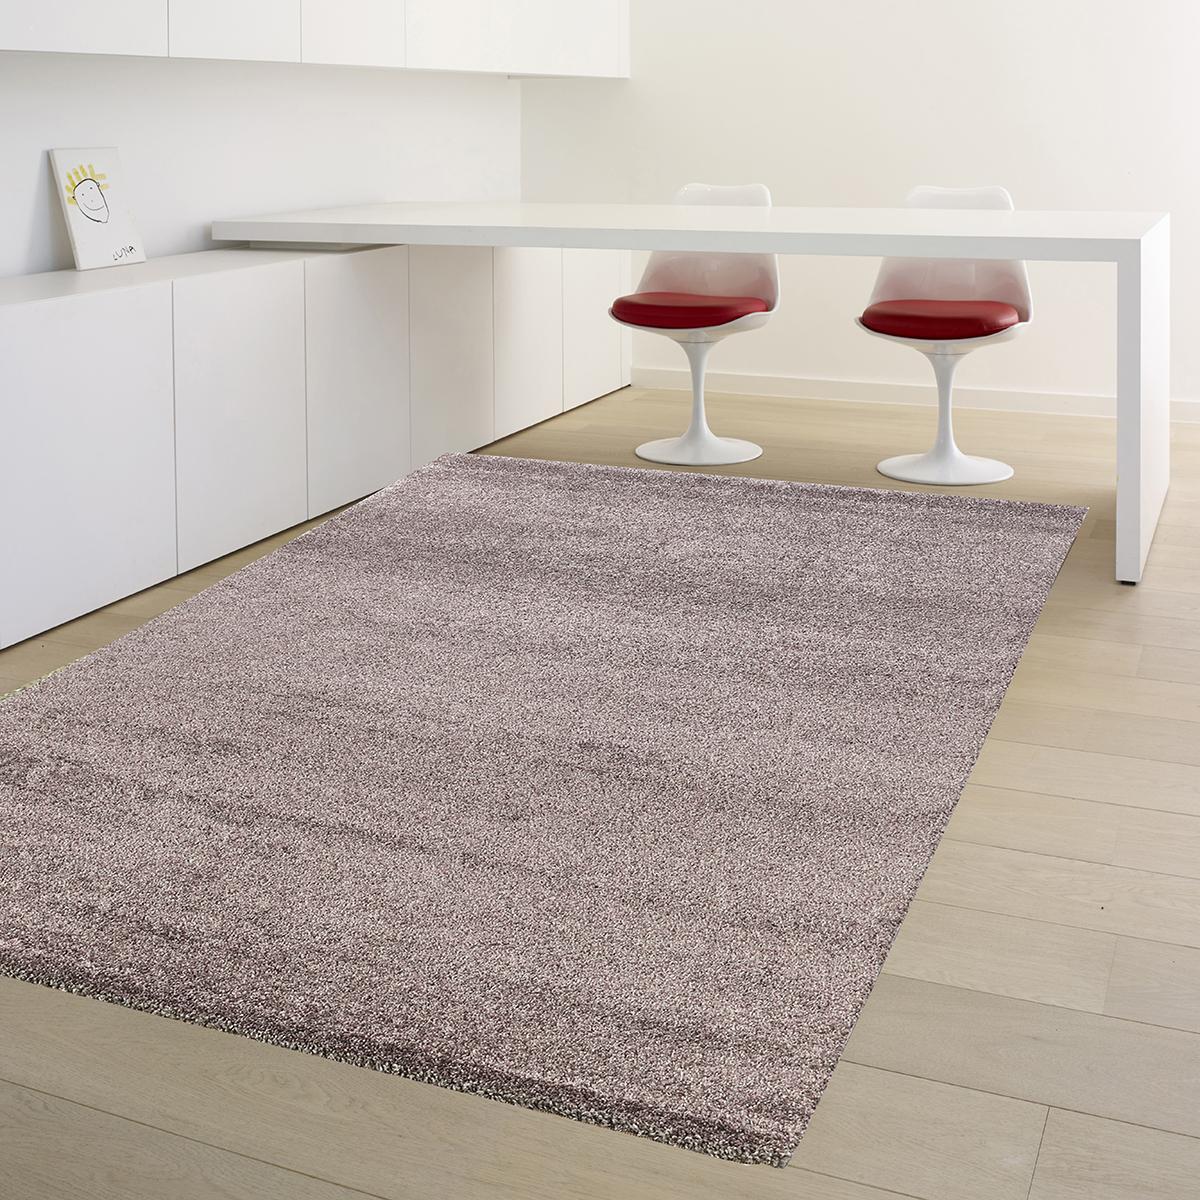 килим Softness меланж беж 160х230